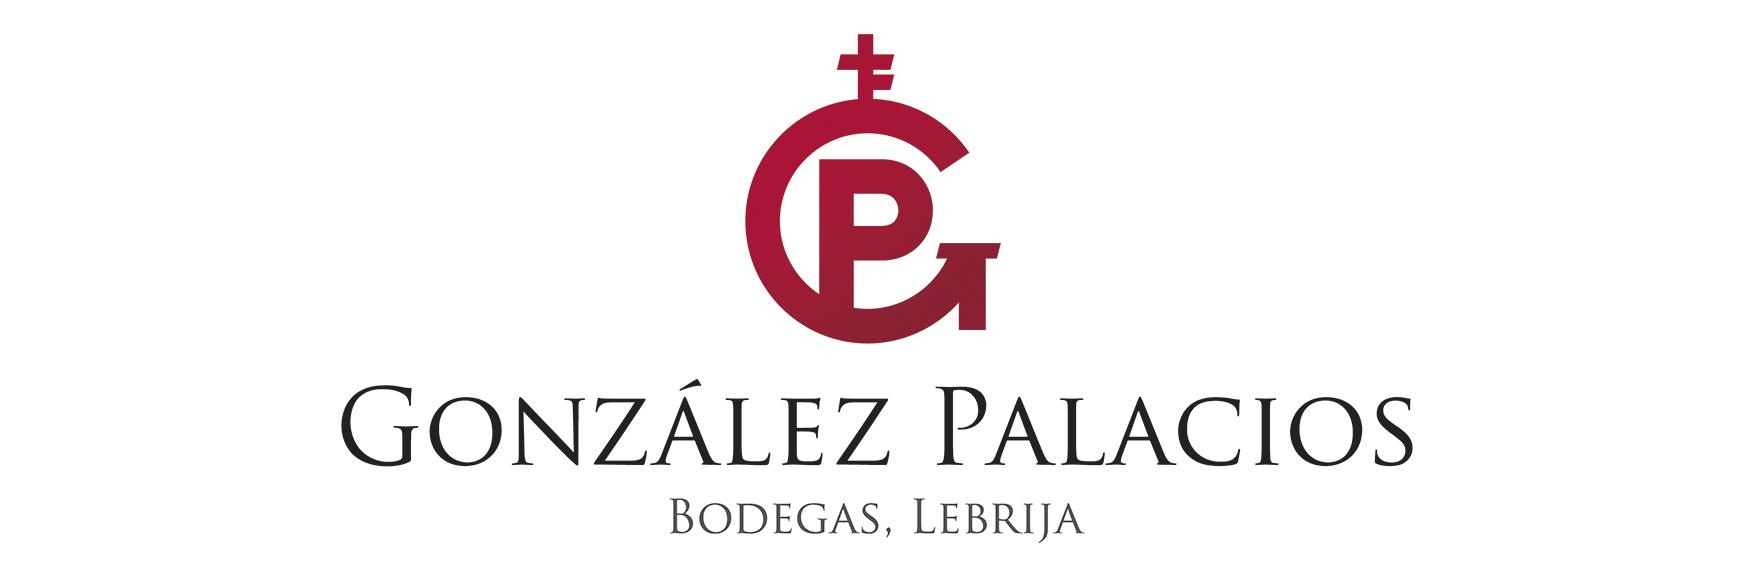 Bodegas González Palacio 酒庄